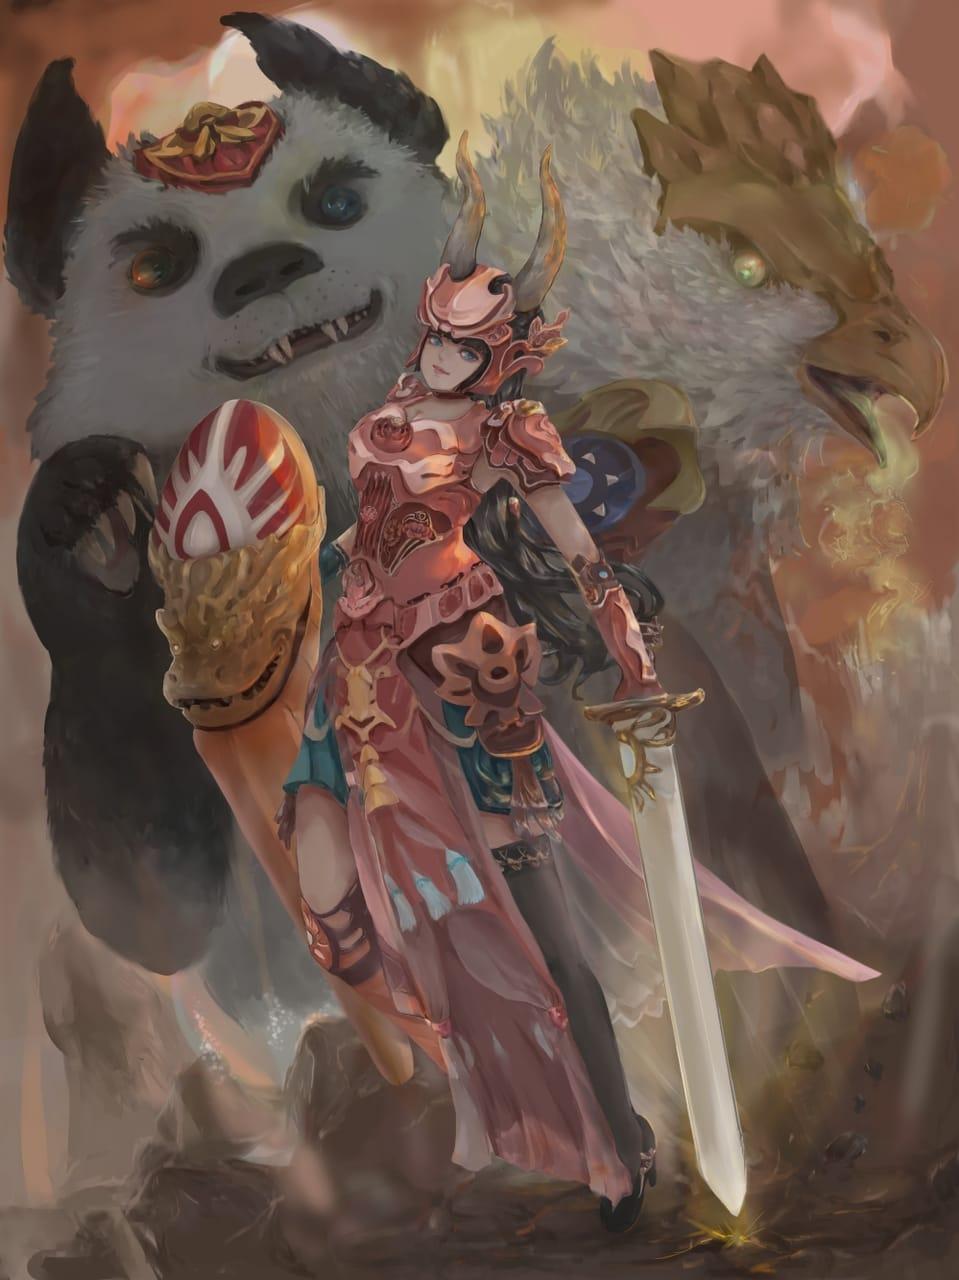 Guard Illust of Piano fantasycharacter sword dragongirl